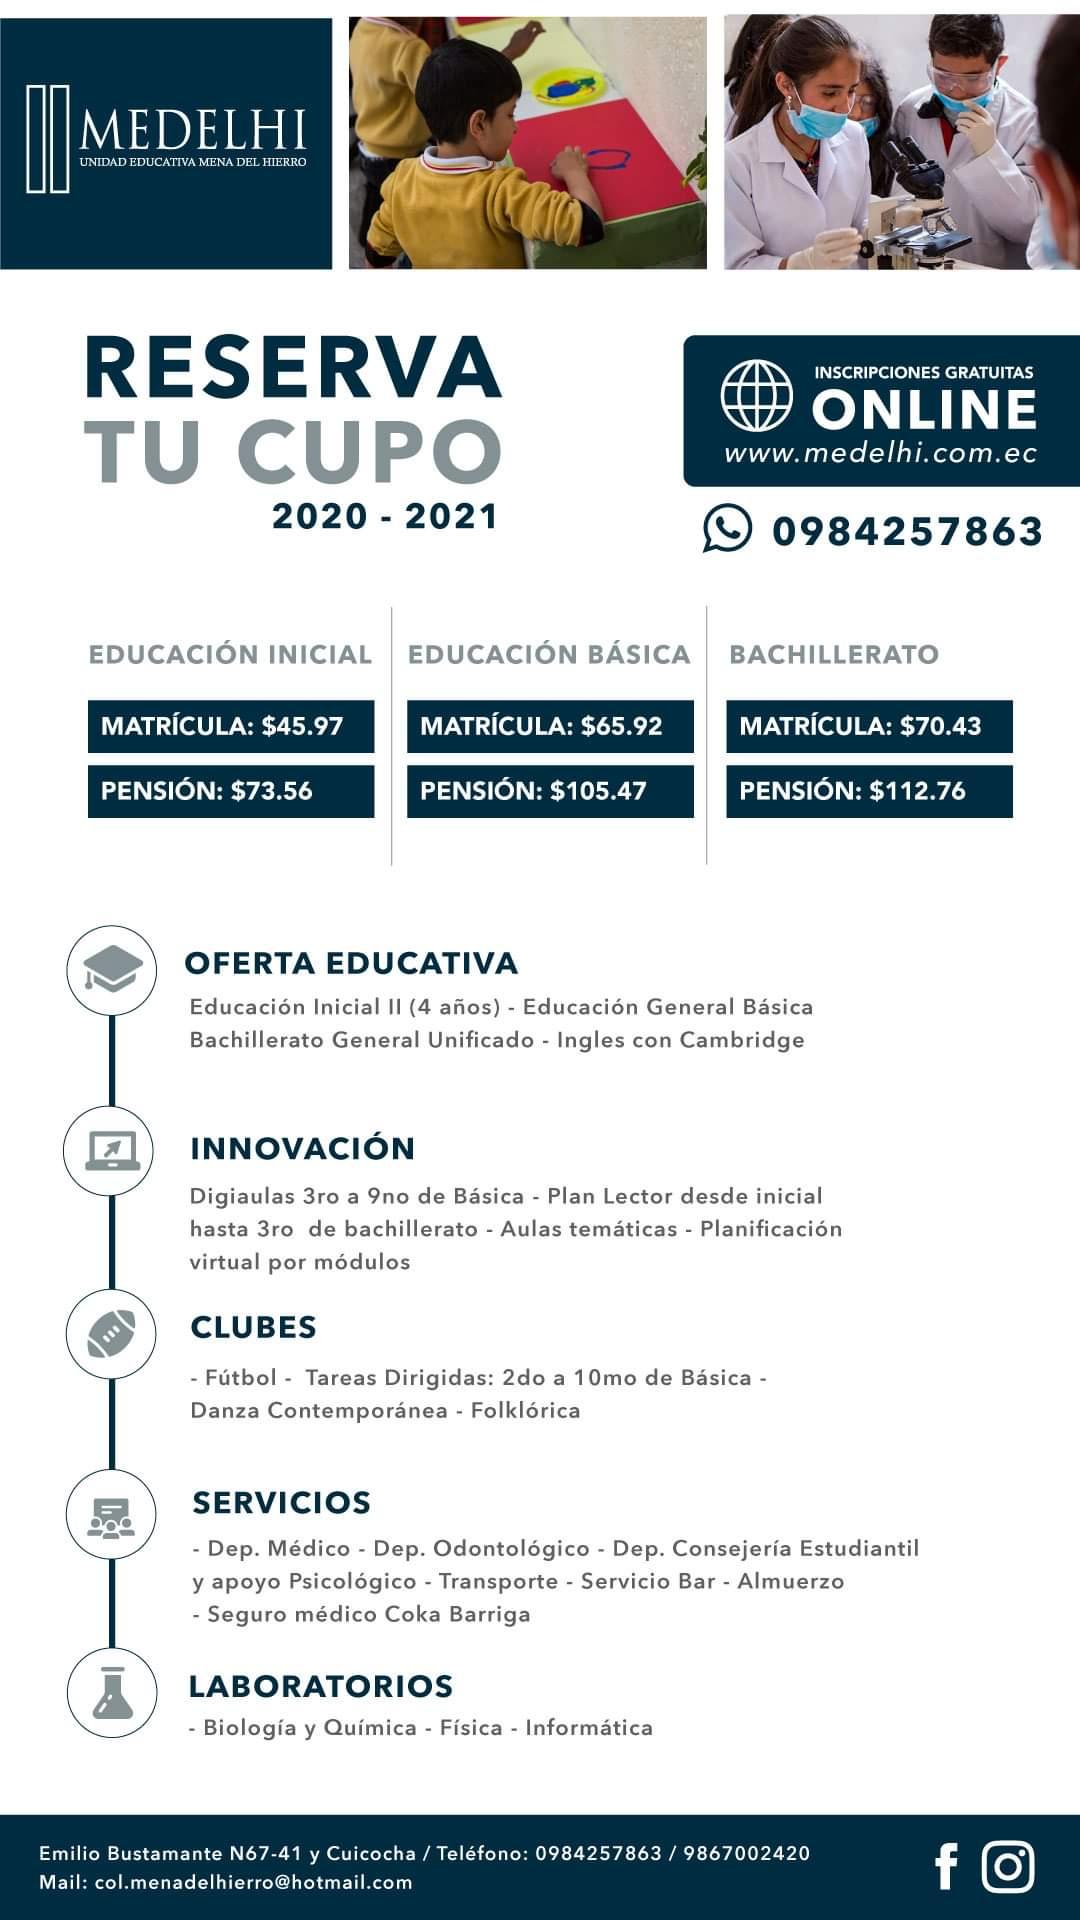 RESERVA TU CUPO ONLINE, MEDELHI 2020-2021